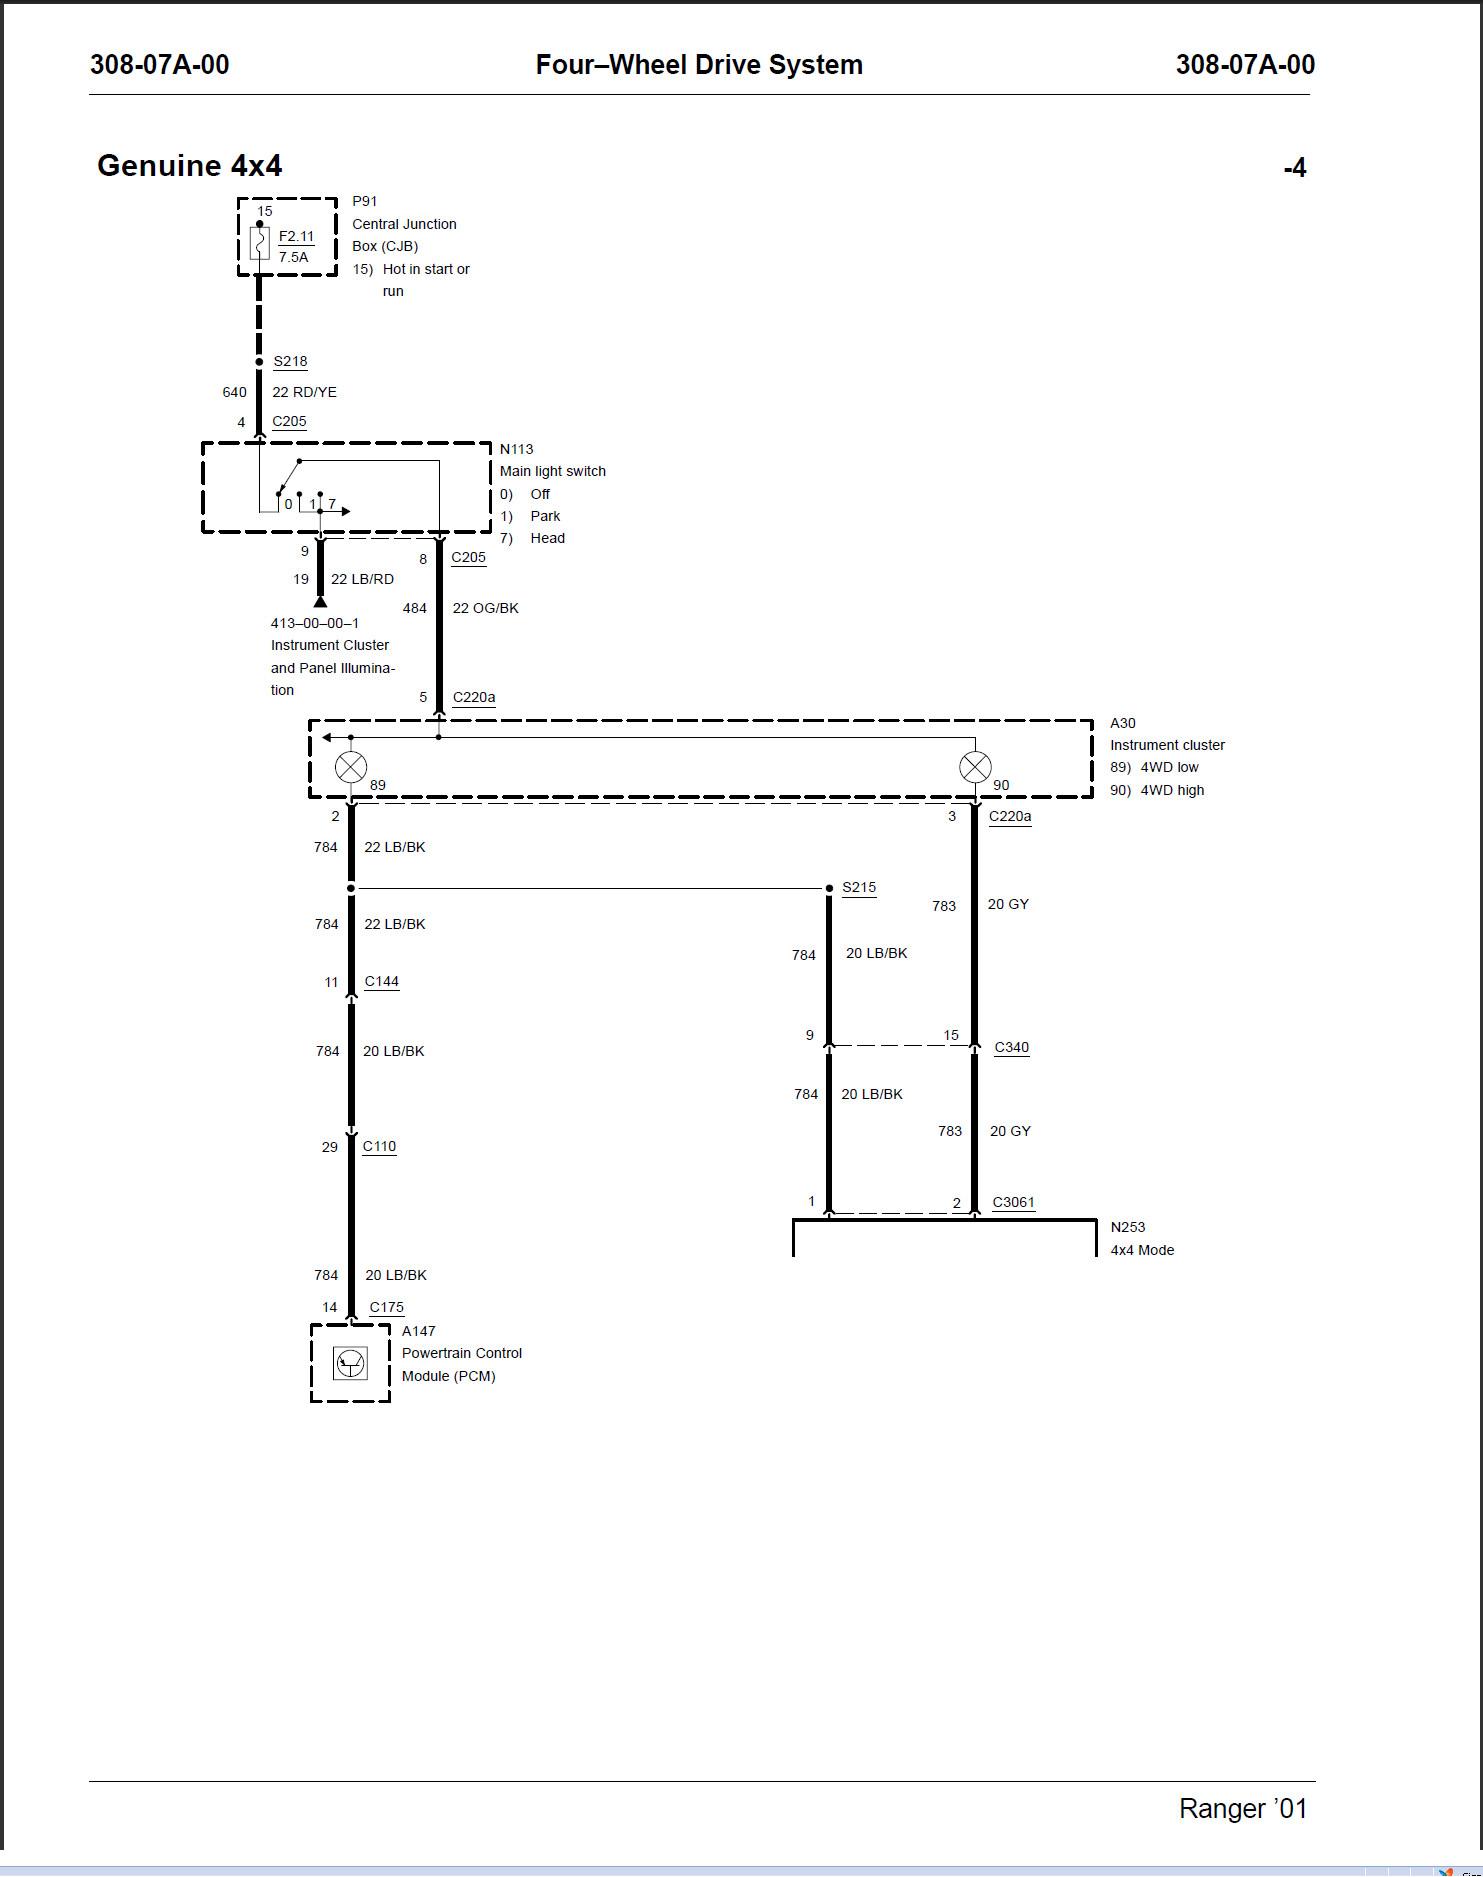 2001 f150 starter wiring diagram mx 7570  ford f150 starter wiring diagram wwwjustanswercom  ford f150 starter wiring diagram